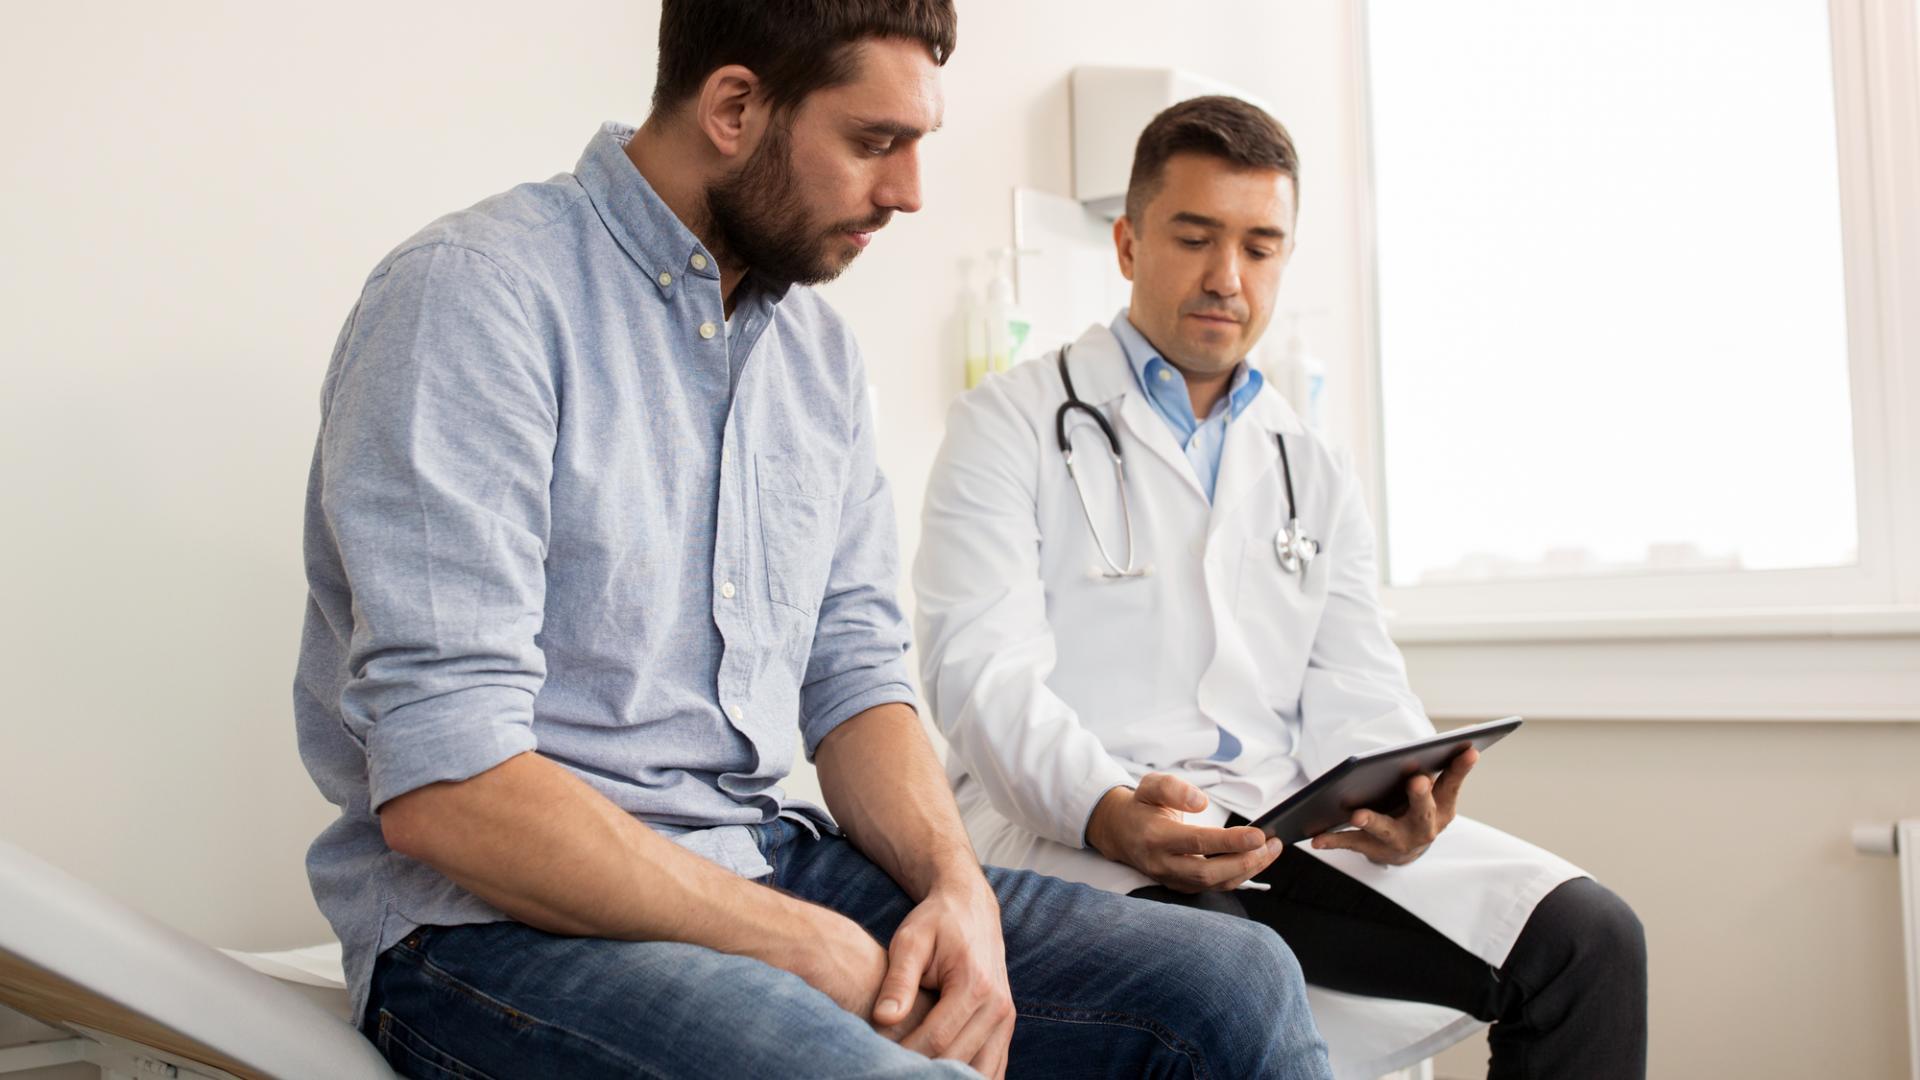 Hodencovid: Macht das Coronavirus unfruchtbar